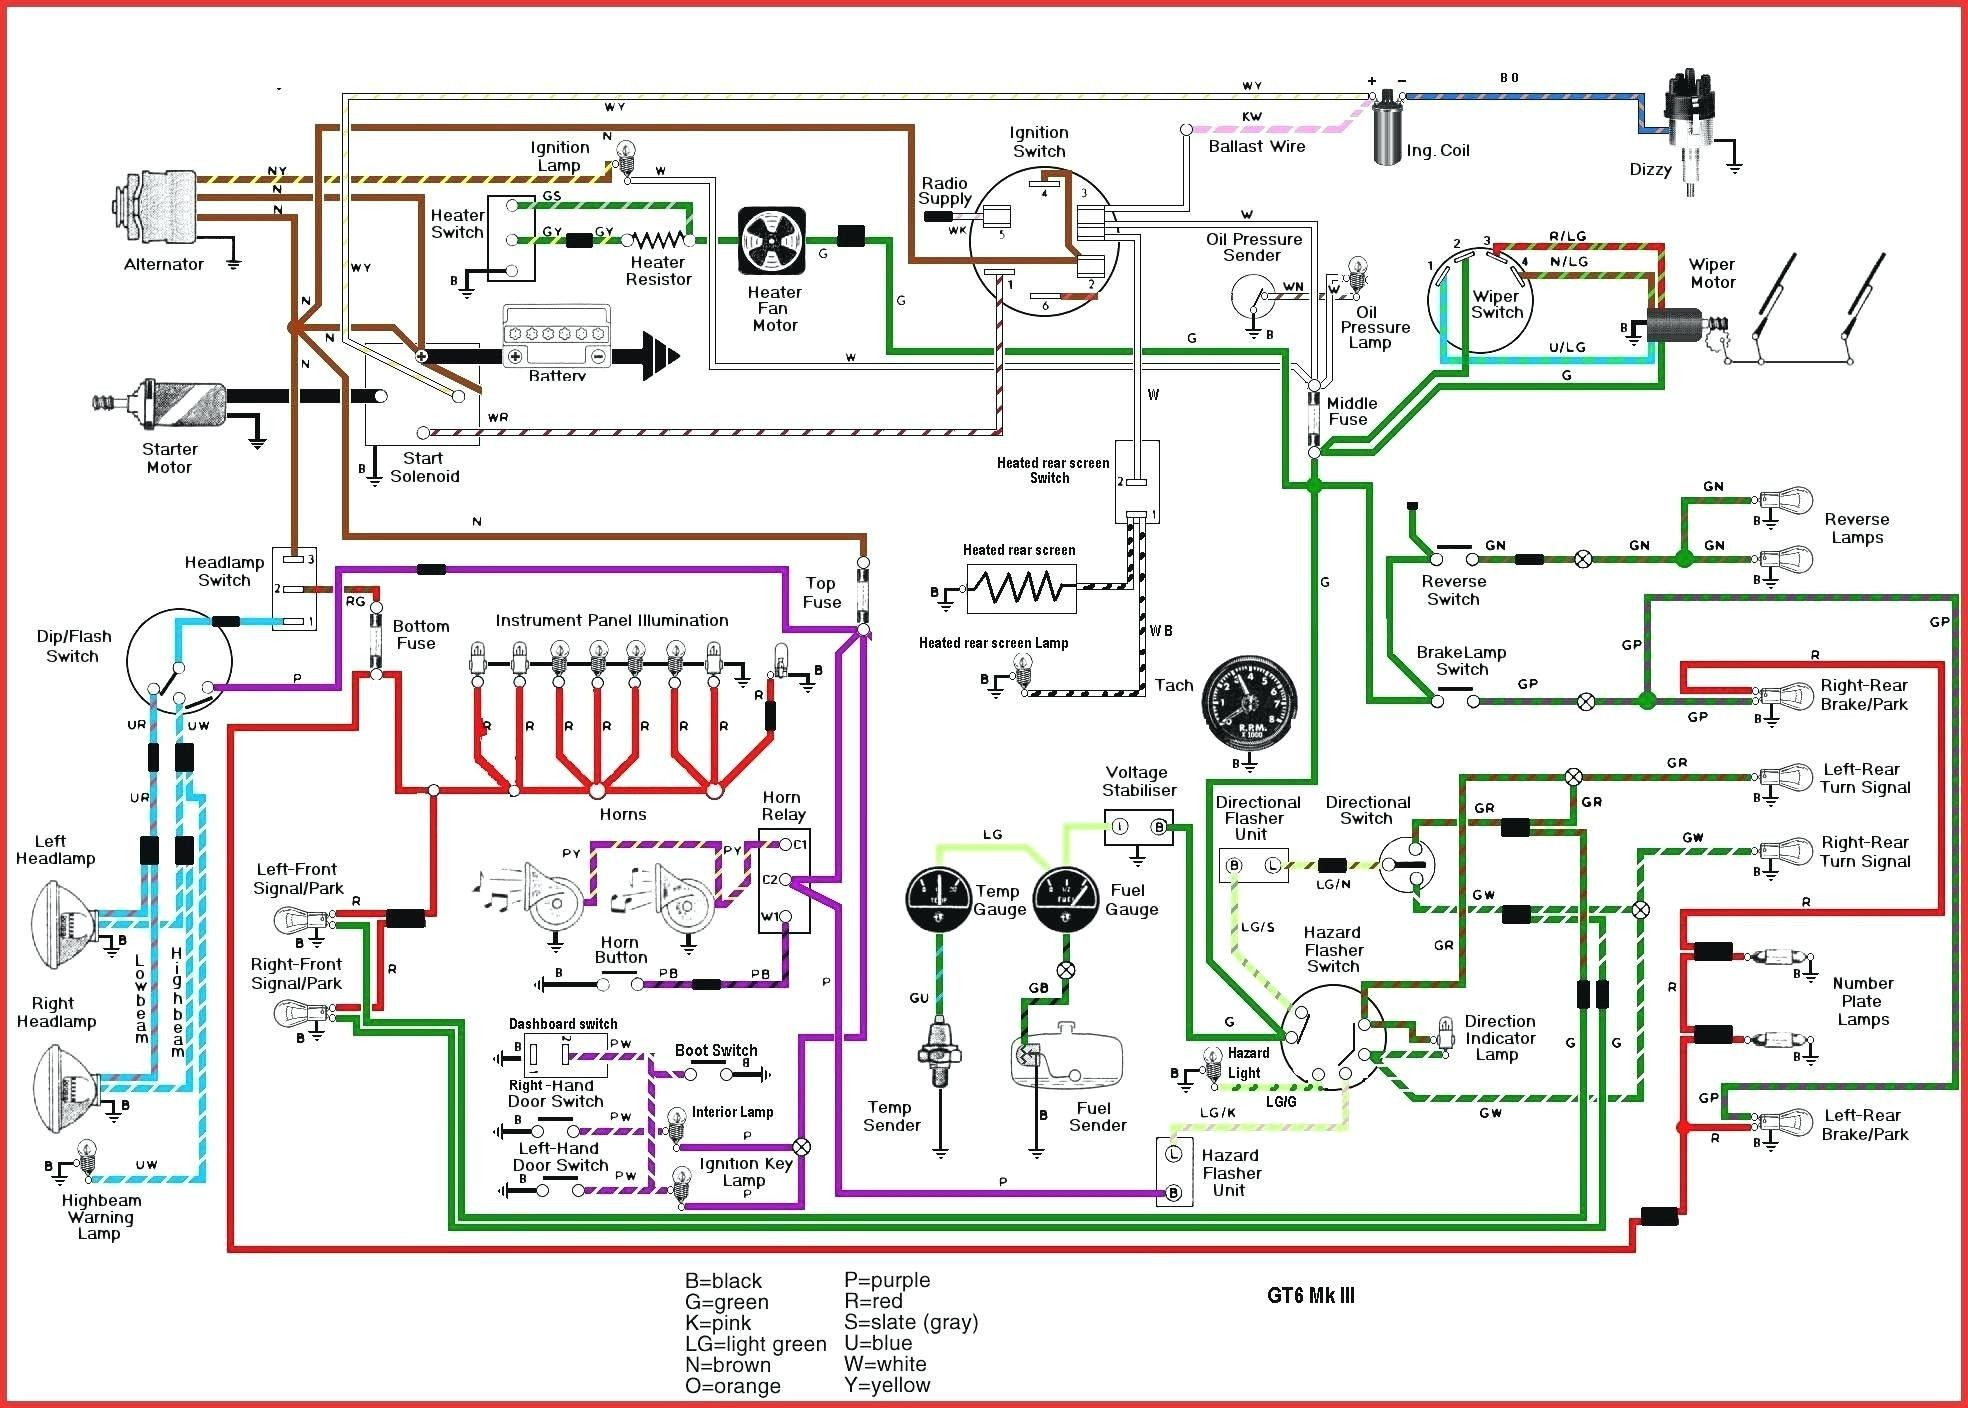 Unique Central Heating Wiring Diagram Uk diagramsample